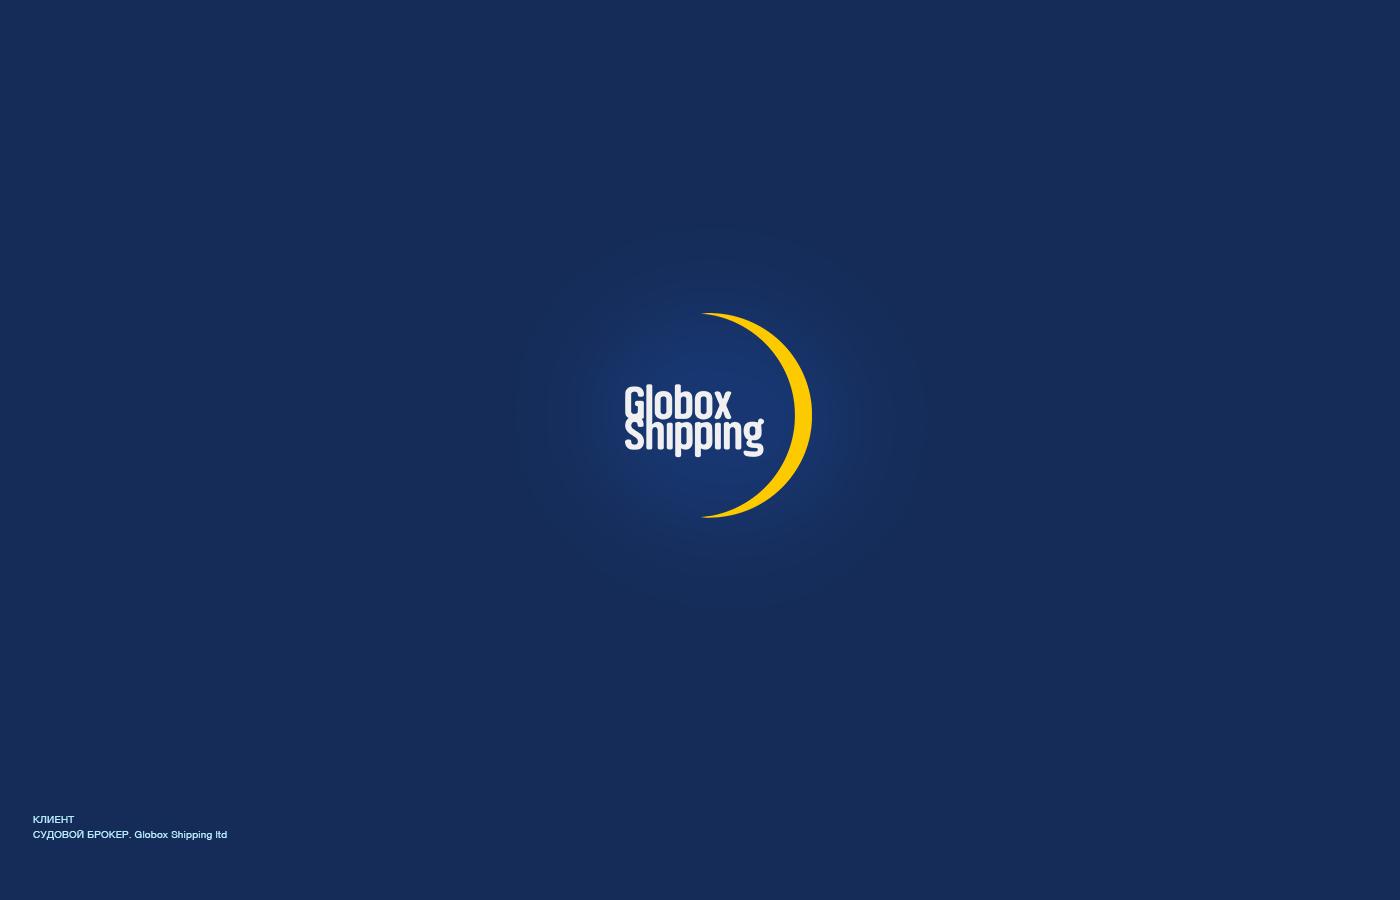 логотип, дизайн, спецтехника, бренд, брендинг, brand, logo, design, turbion, аренда, корабли, онлайн магазин, фирменный стиль,